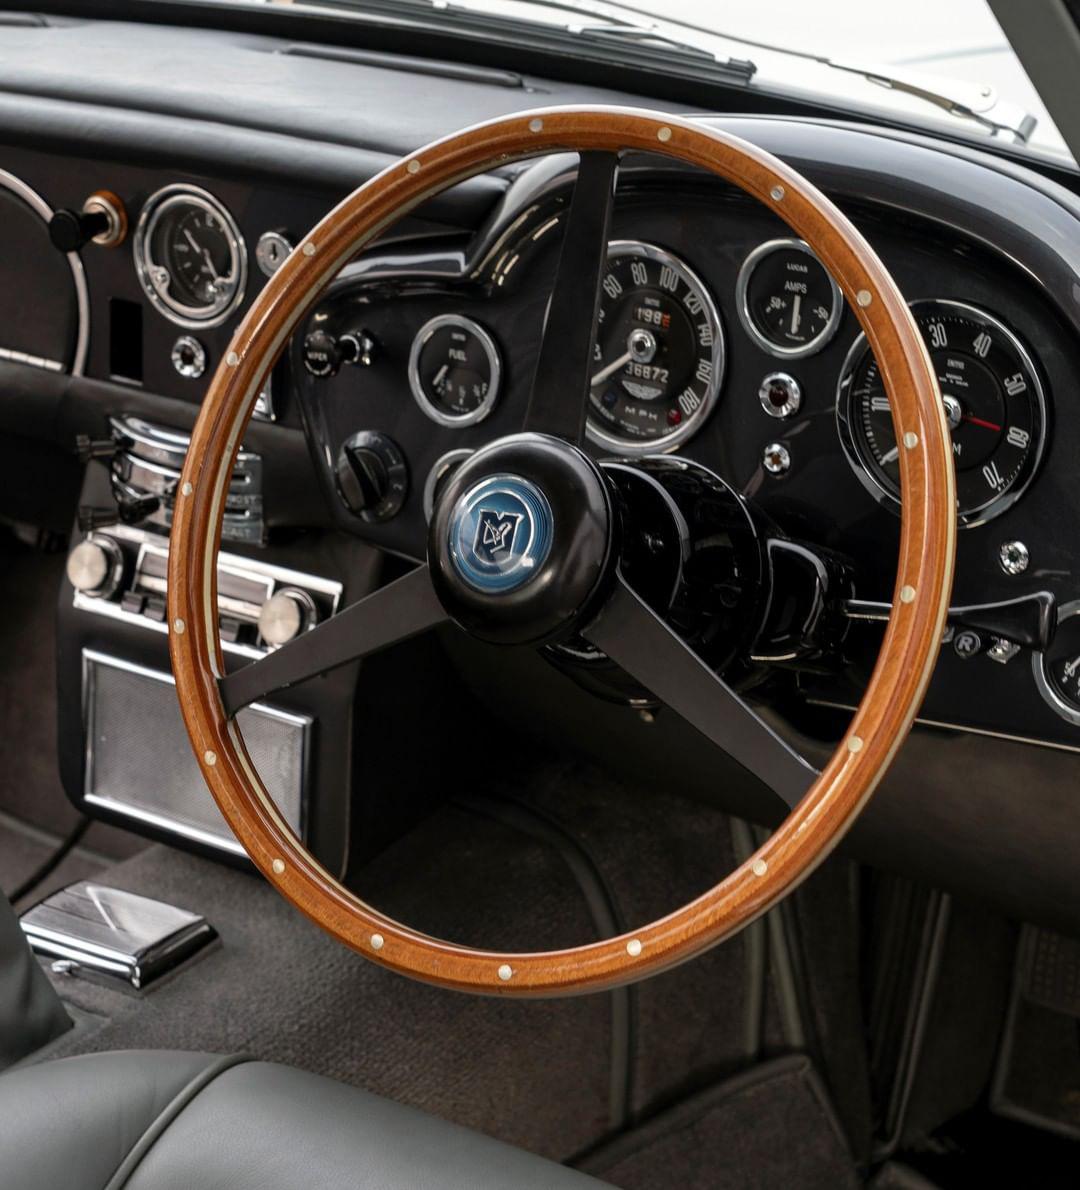 Aston Martin Starts Production Of 25 Db5 Continuation Models Bond Lifestyle